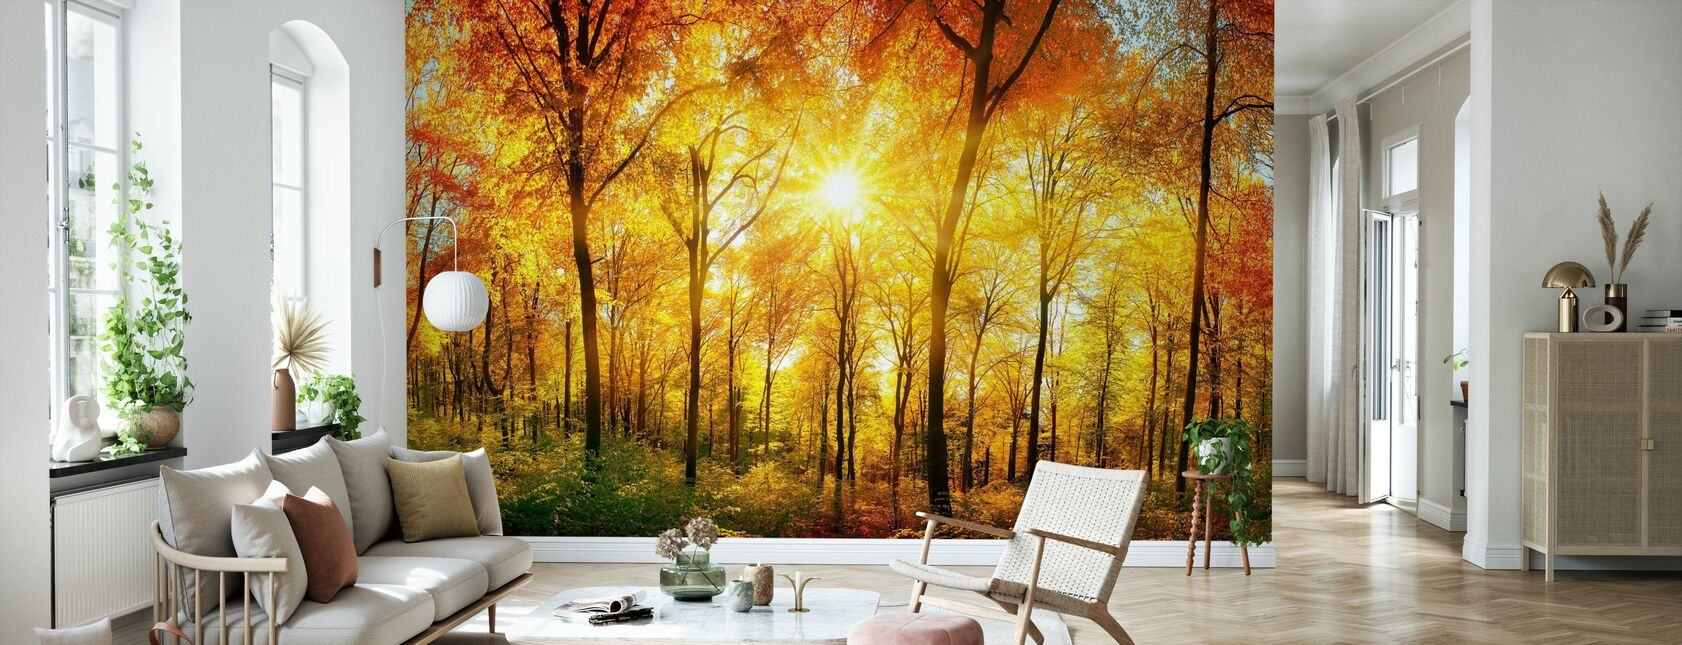 Autumn Forest - Wallpaper - Living Room